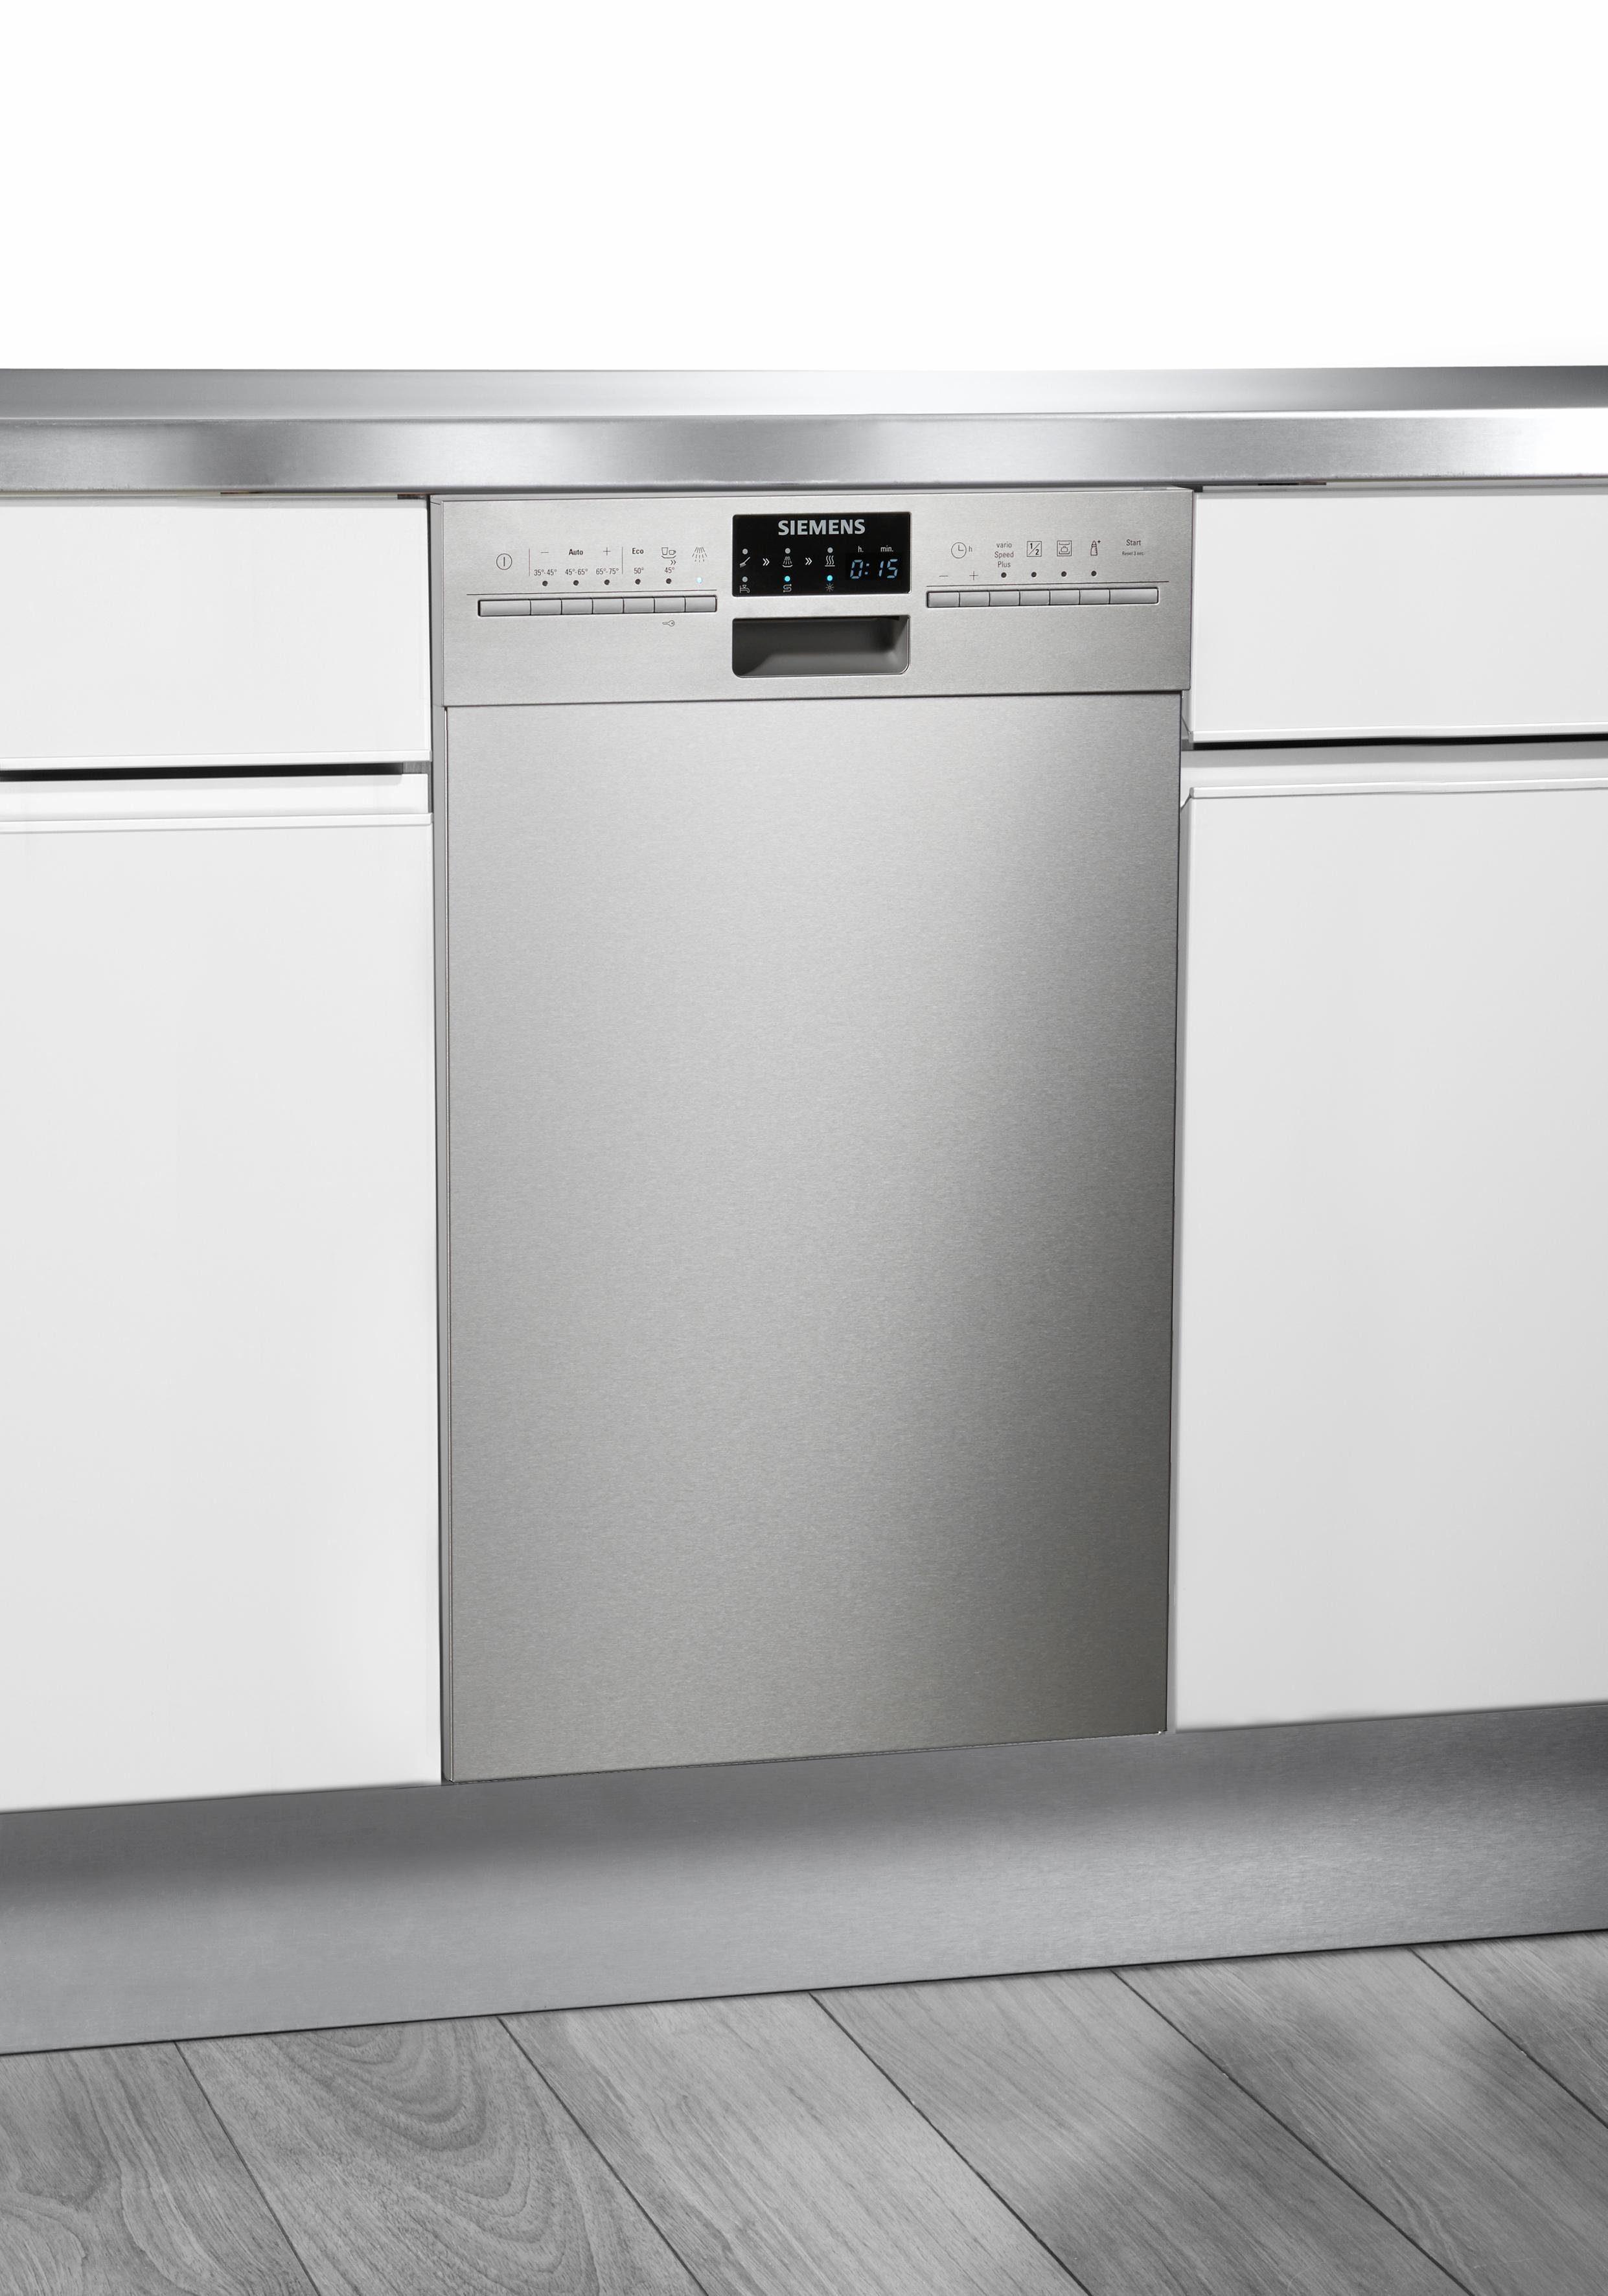 Siemens Unterbau-Geschirrspüler SR46T557EU, Energieklasse A++, 8,5 Liter, 9 Maßgedecke